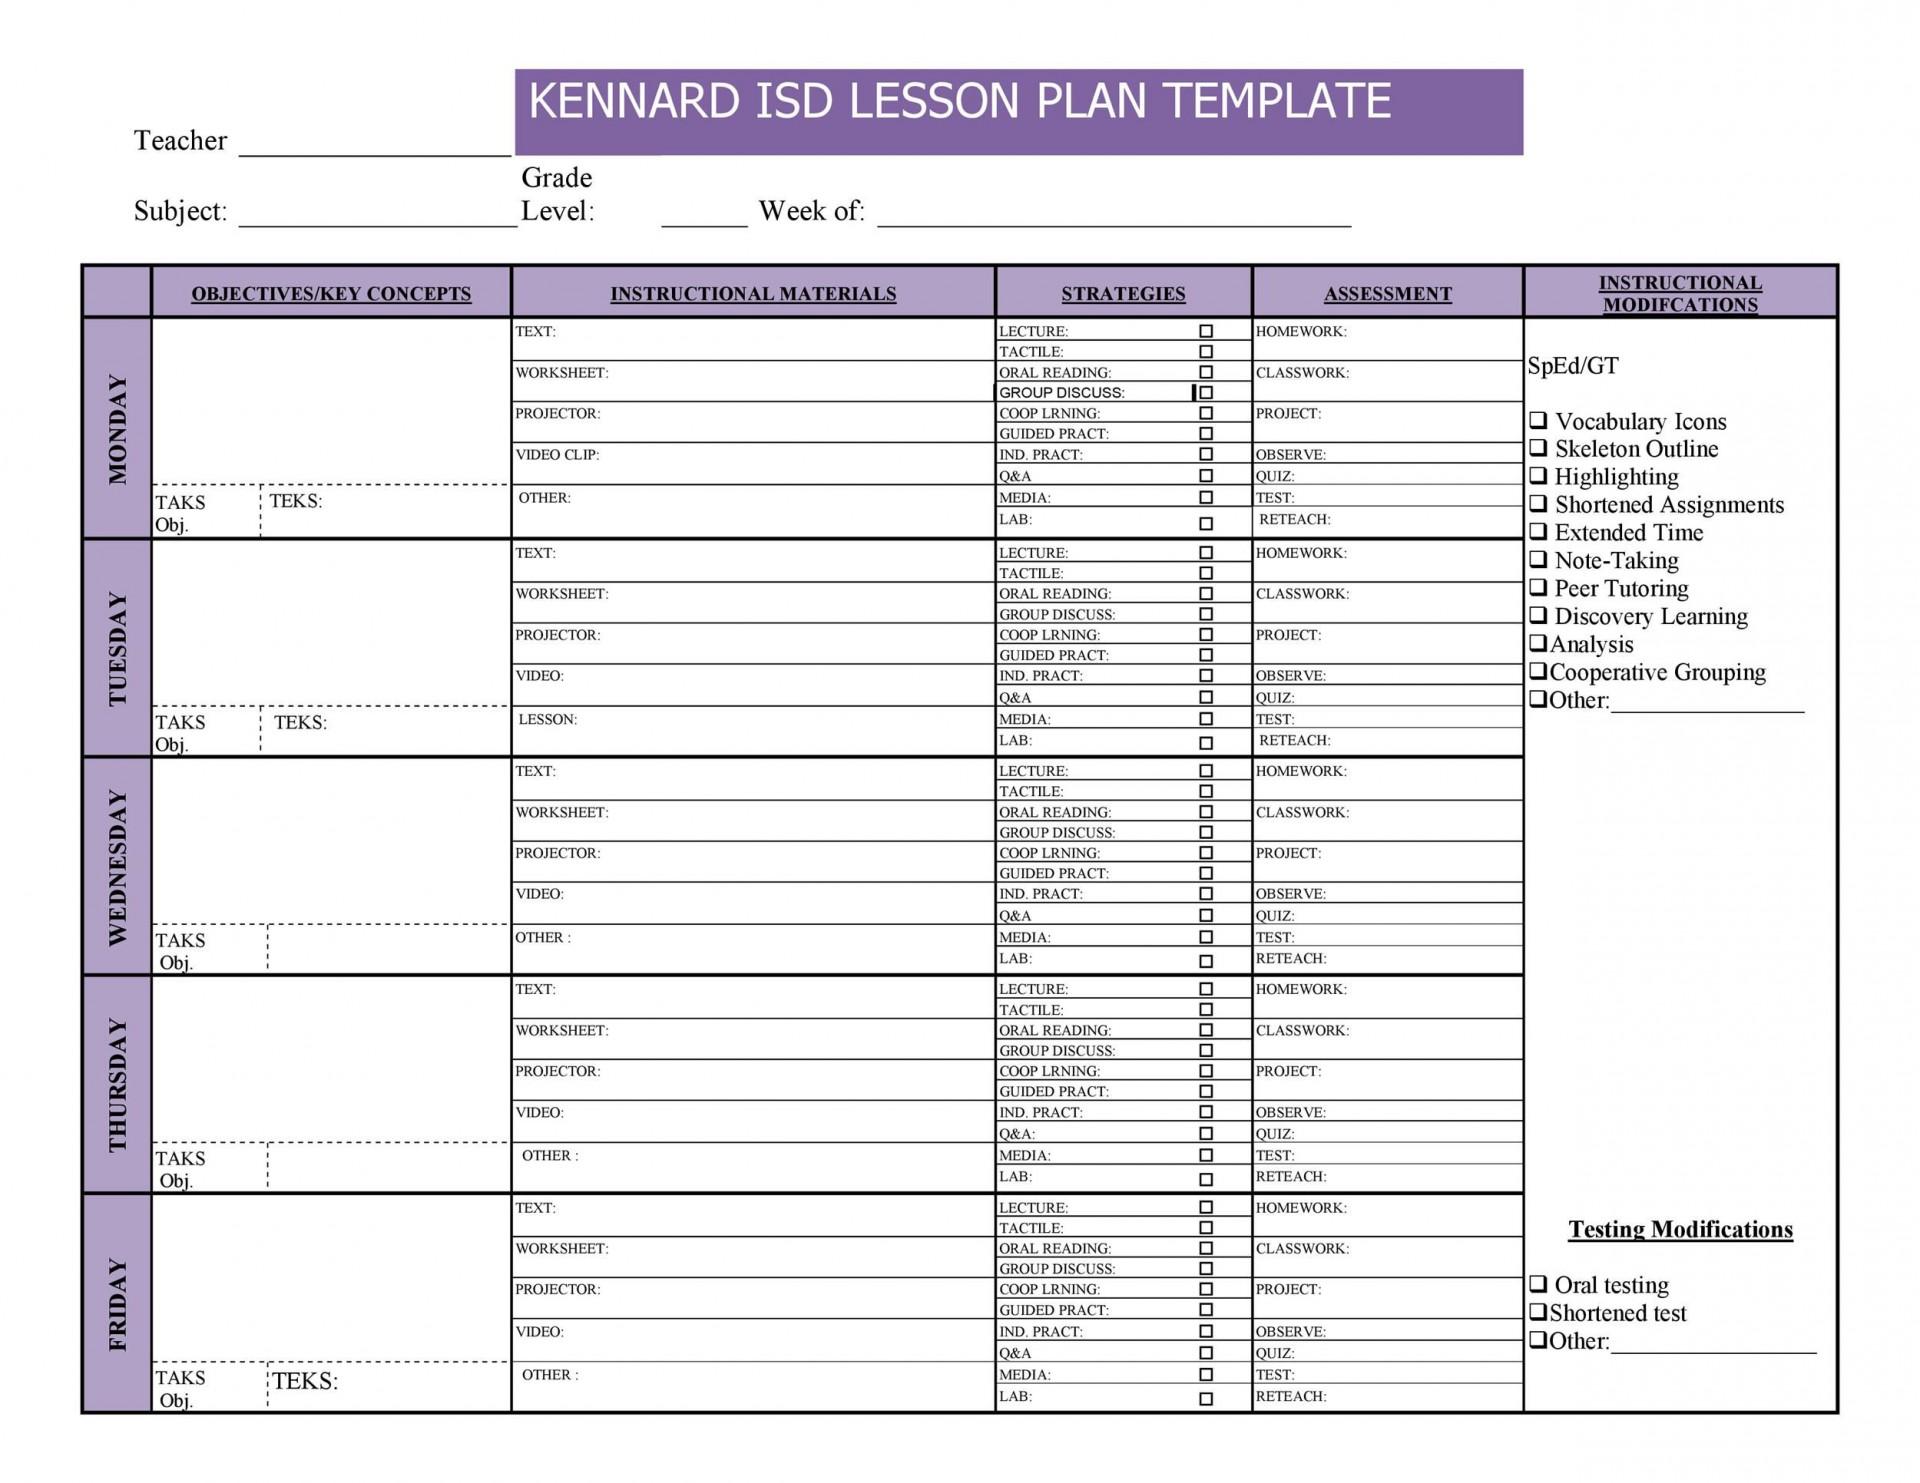 005 Stirring Preschool Weekly Lesson Plan Template Concept  Editable Pdf Word1920